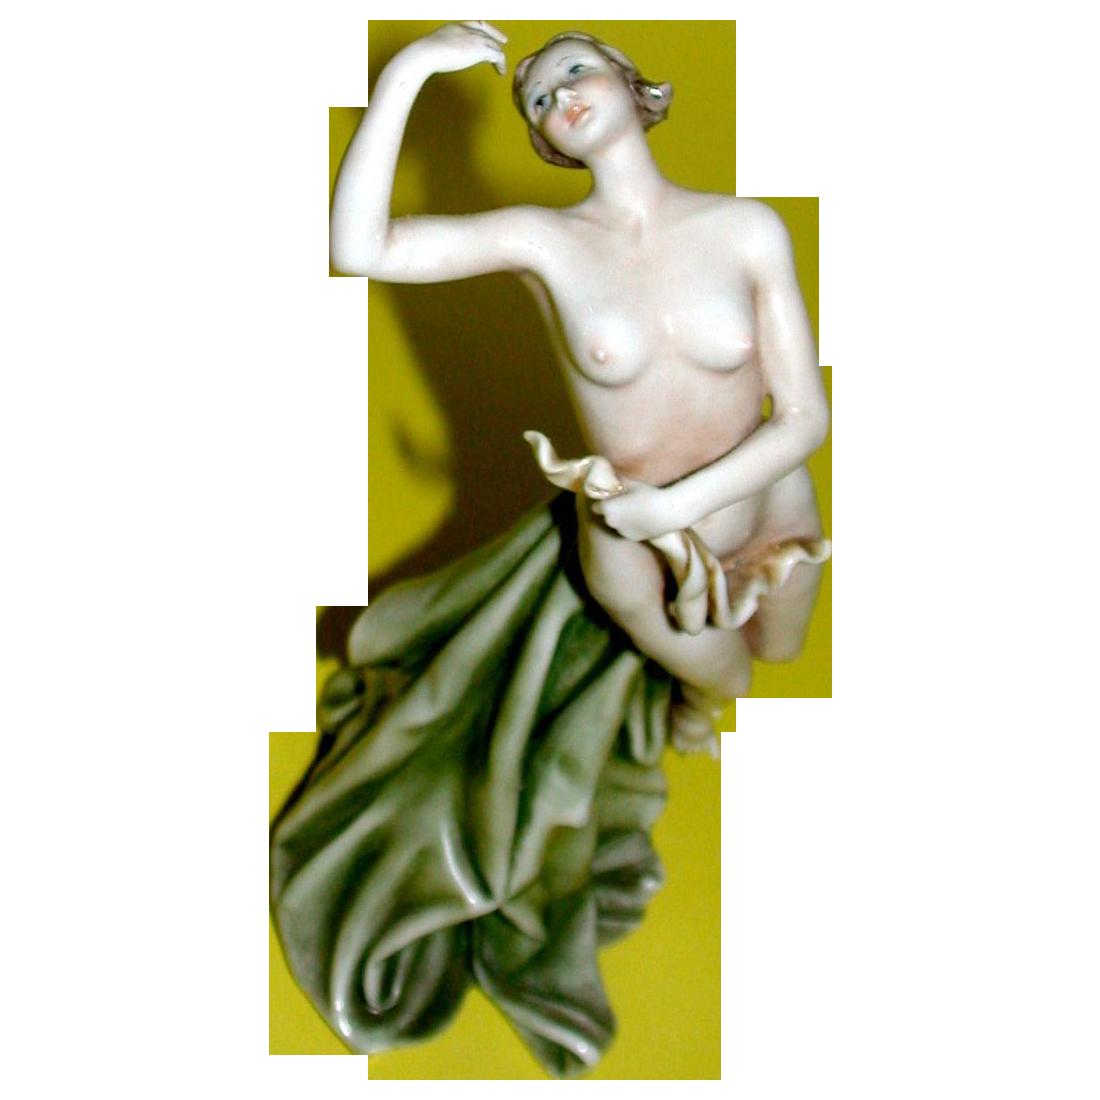 Borsato - Very Rare Nude